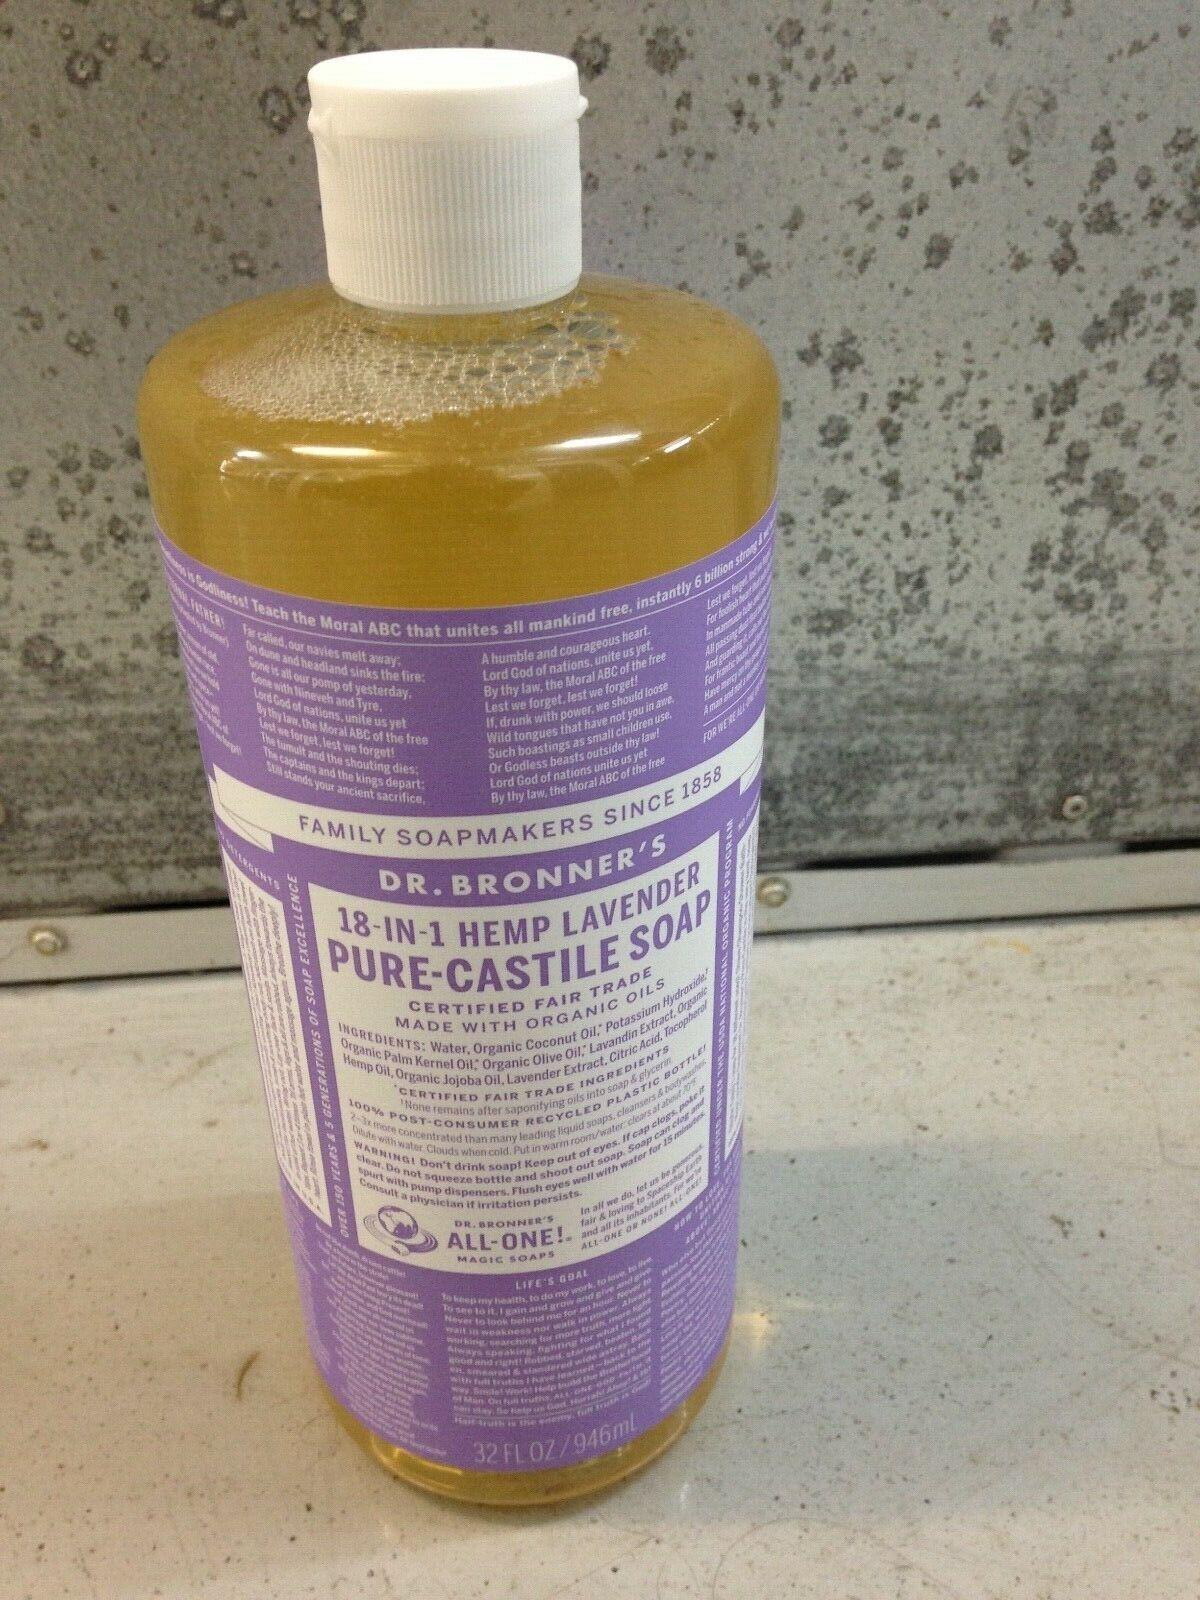 Dr. Bronners Pure Castile Soap Hemp Lavender 32 Fl. Oz 18-in-1  - $10.79